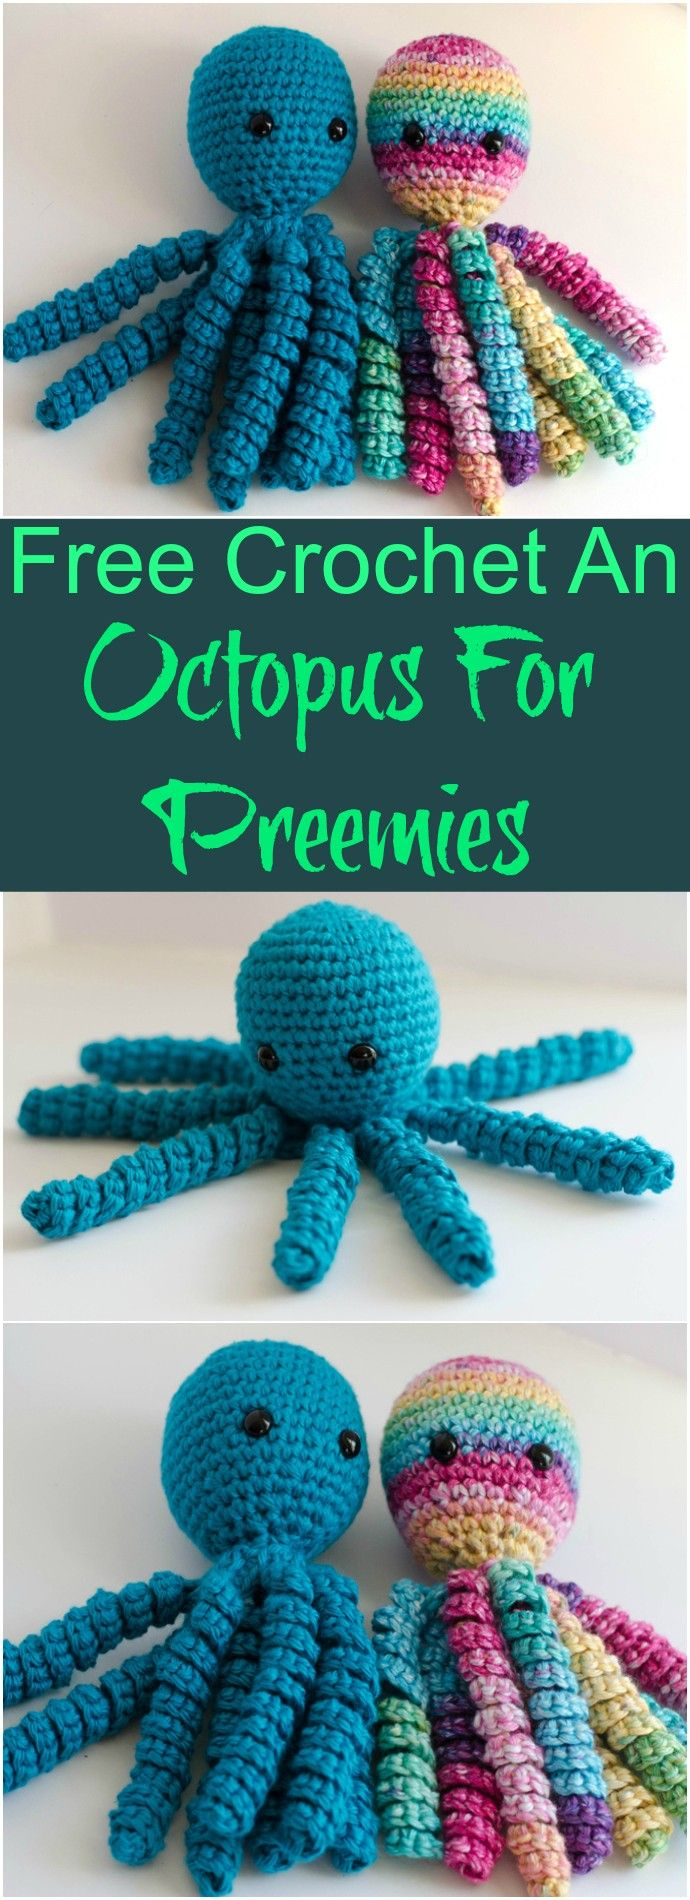 Crochet Octopus Patterns- Free Patterns